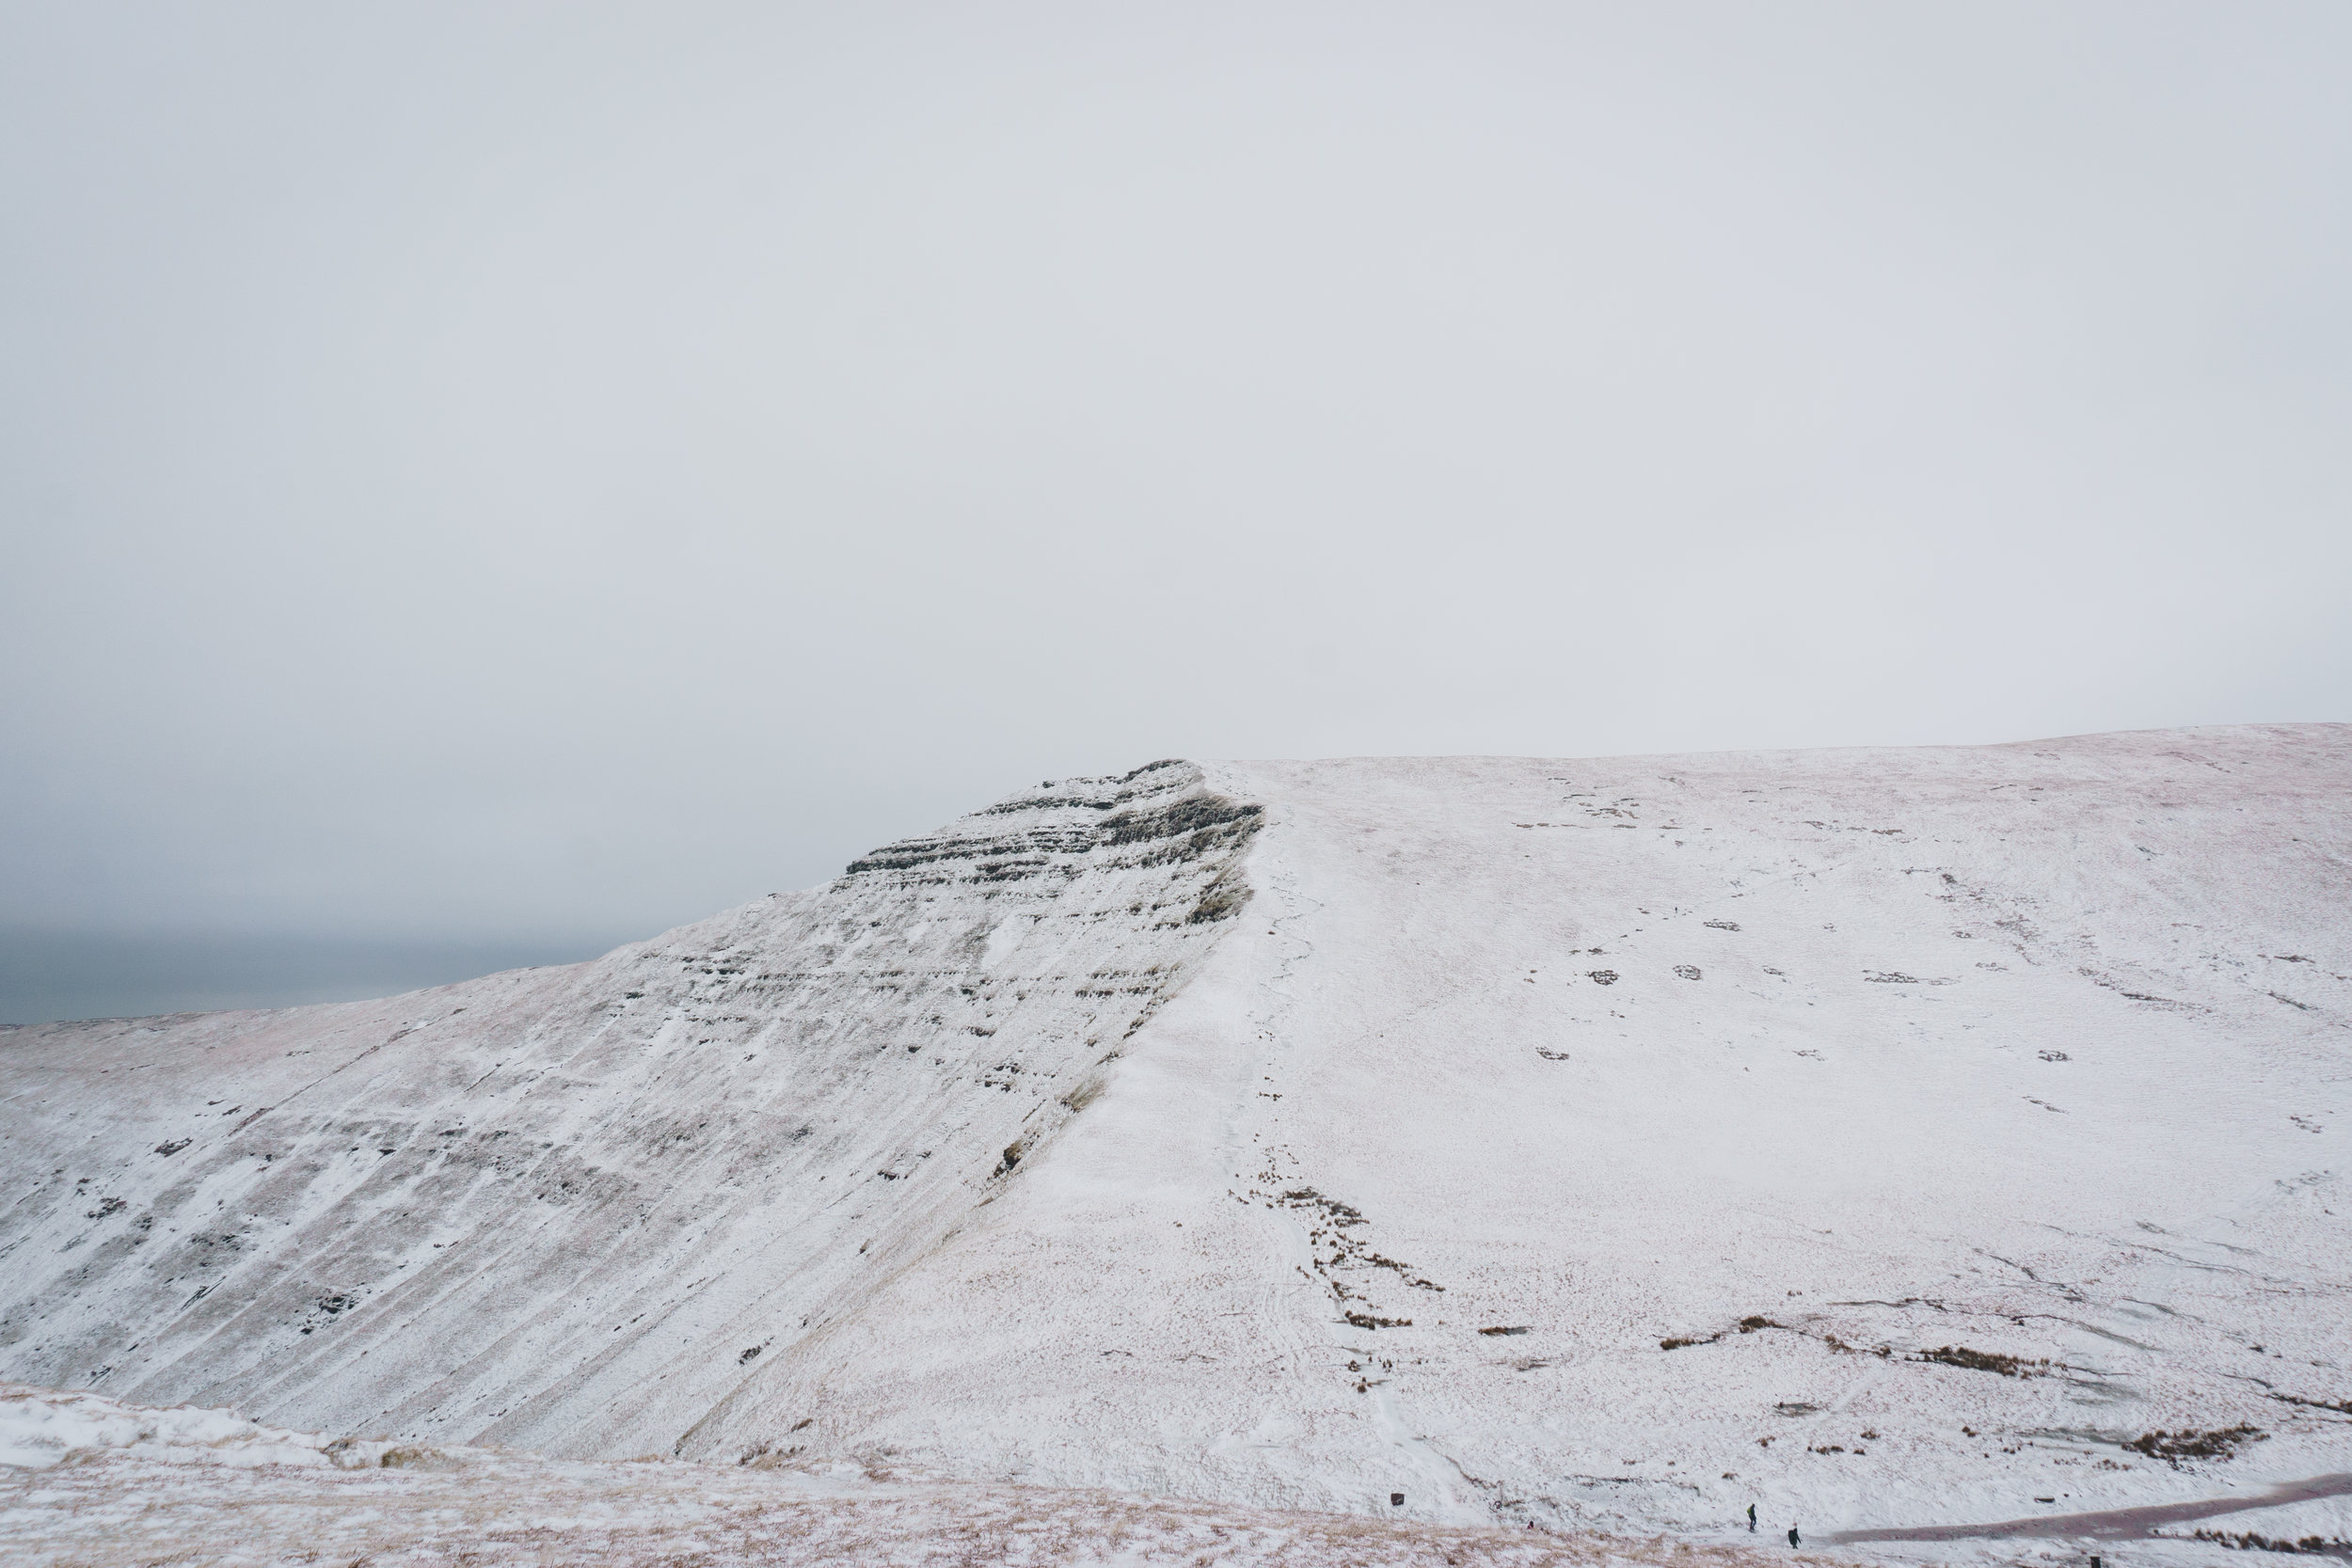 Brecon Beacons – March 2018